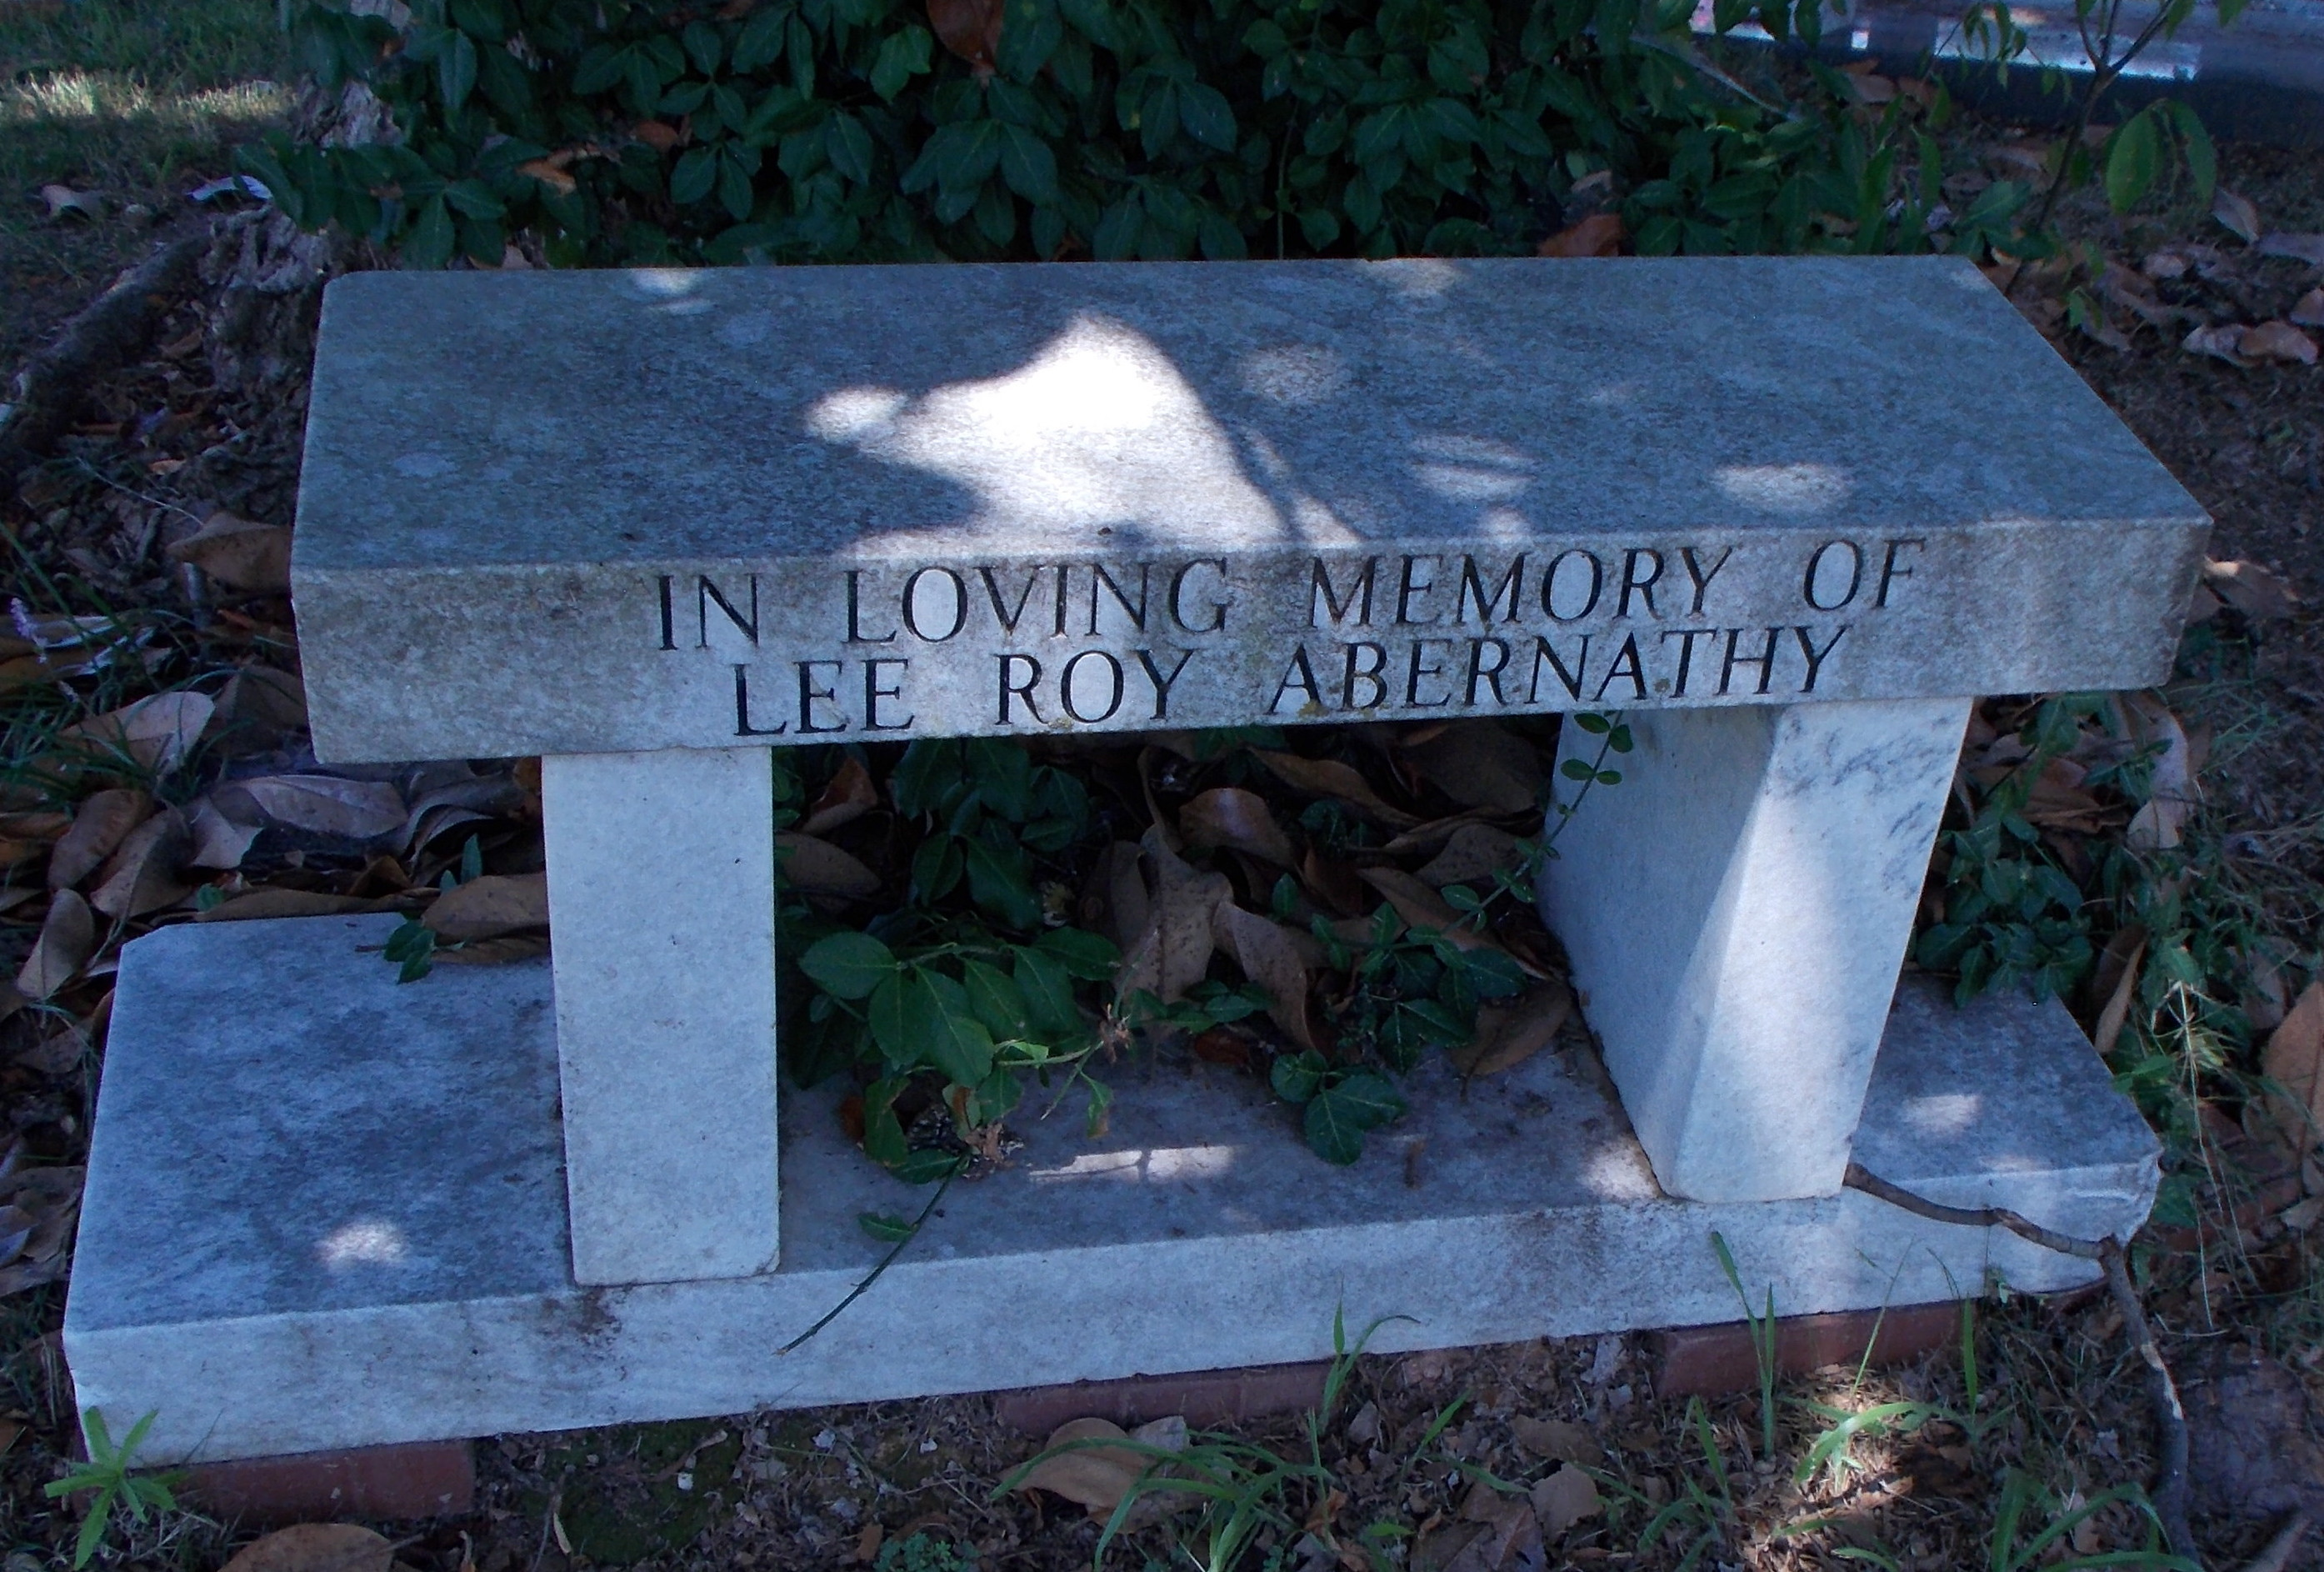 Lee Roy Abernathy